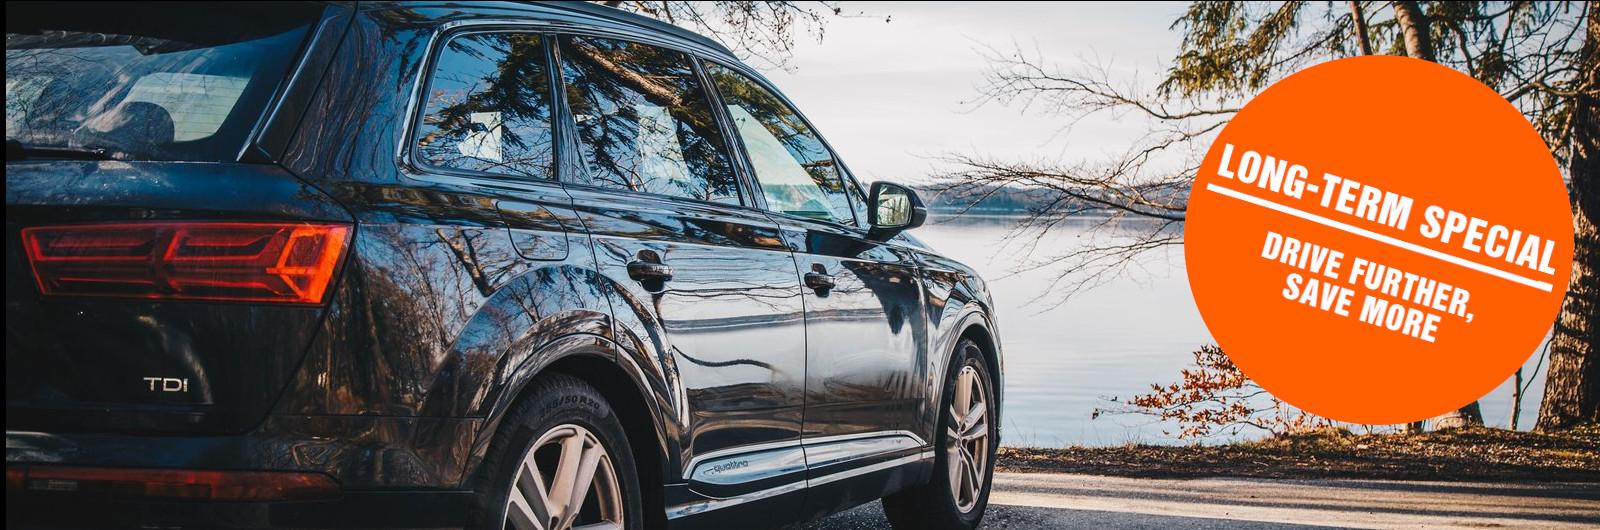 Huge Discounts on Long Term & Monthly Car Rental | SIXT - Sixt Car rental